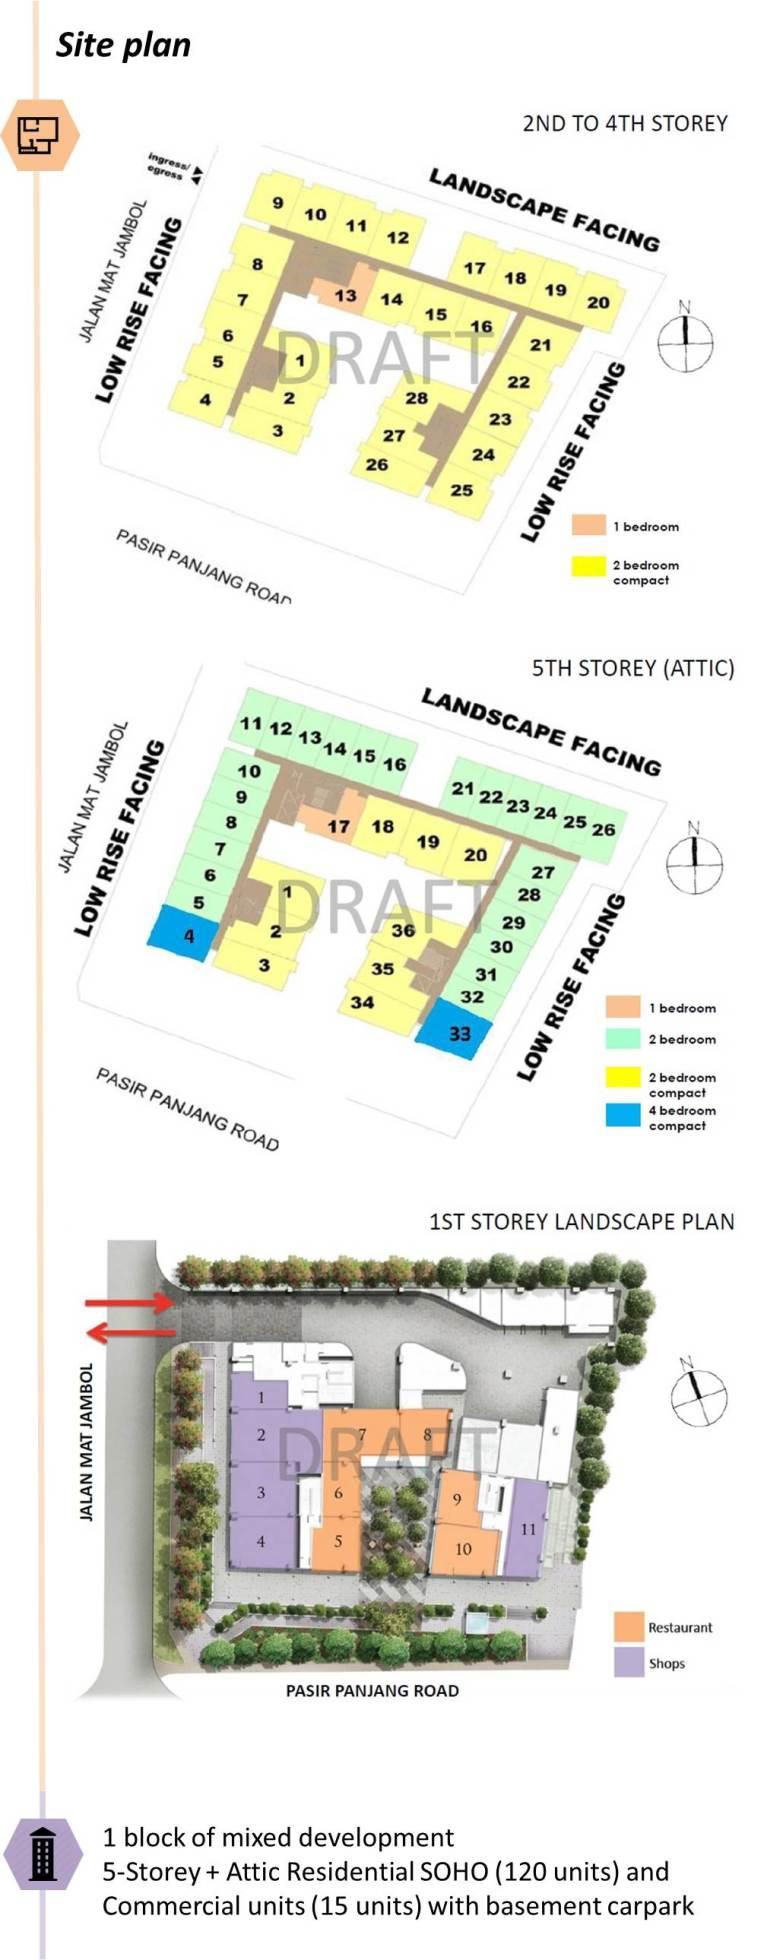 saleapartmentsingapore_bijou_siteplan